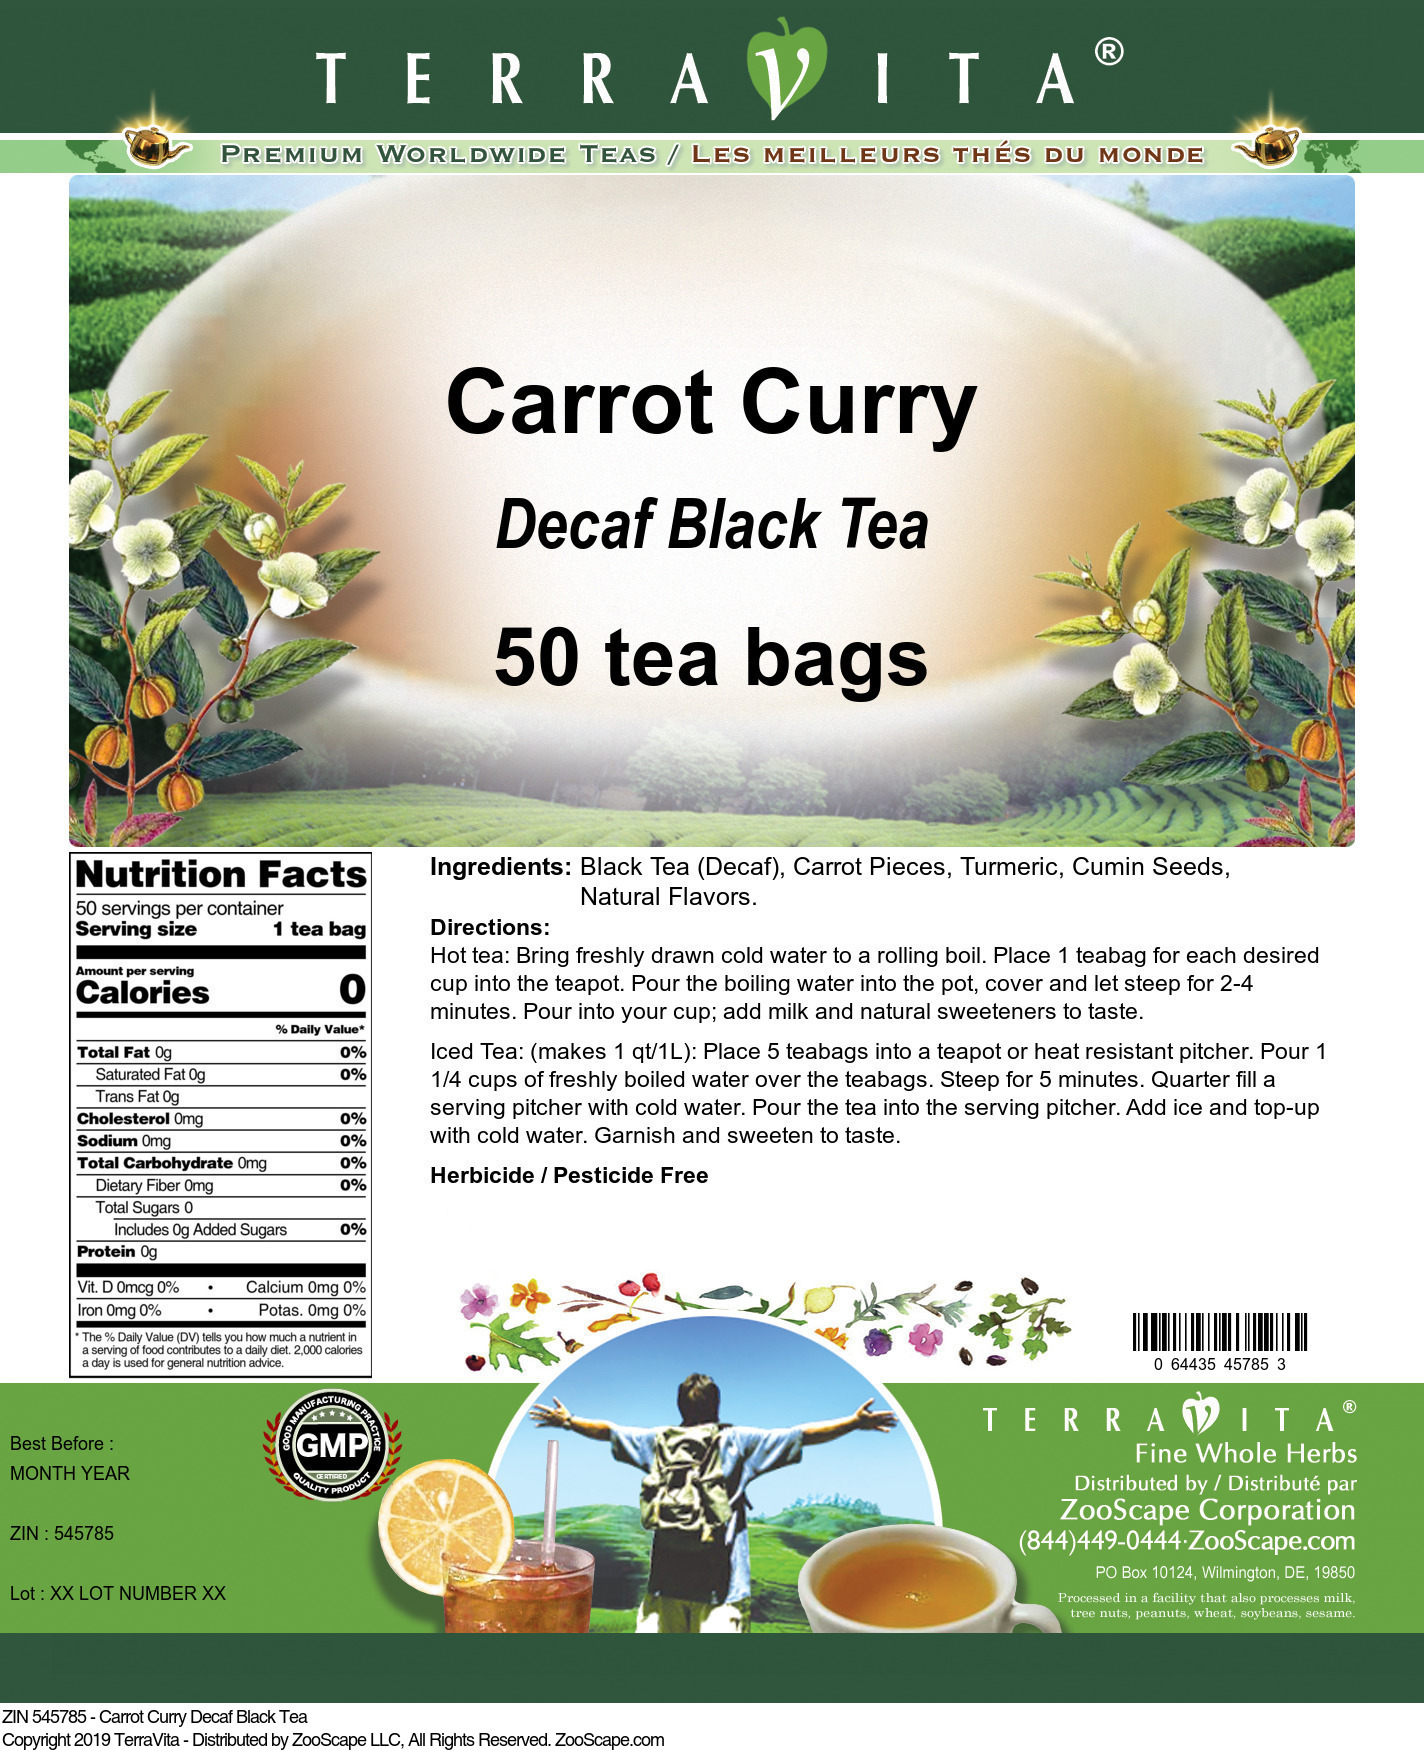 Carrot Curry Decaf Black Tea